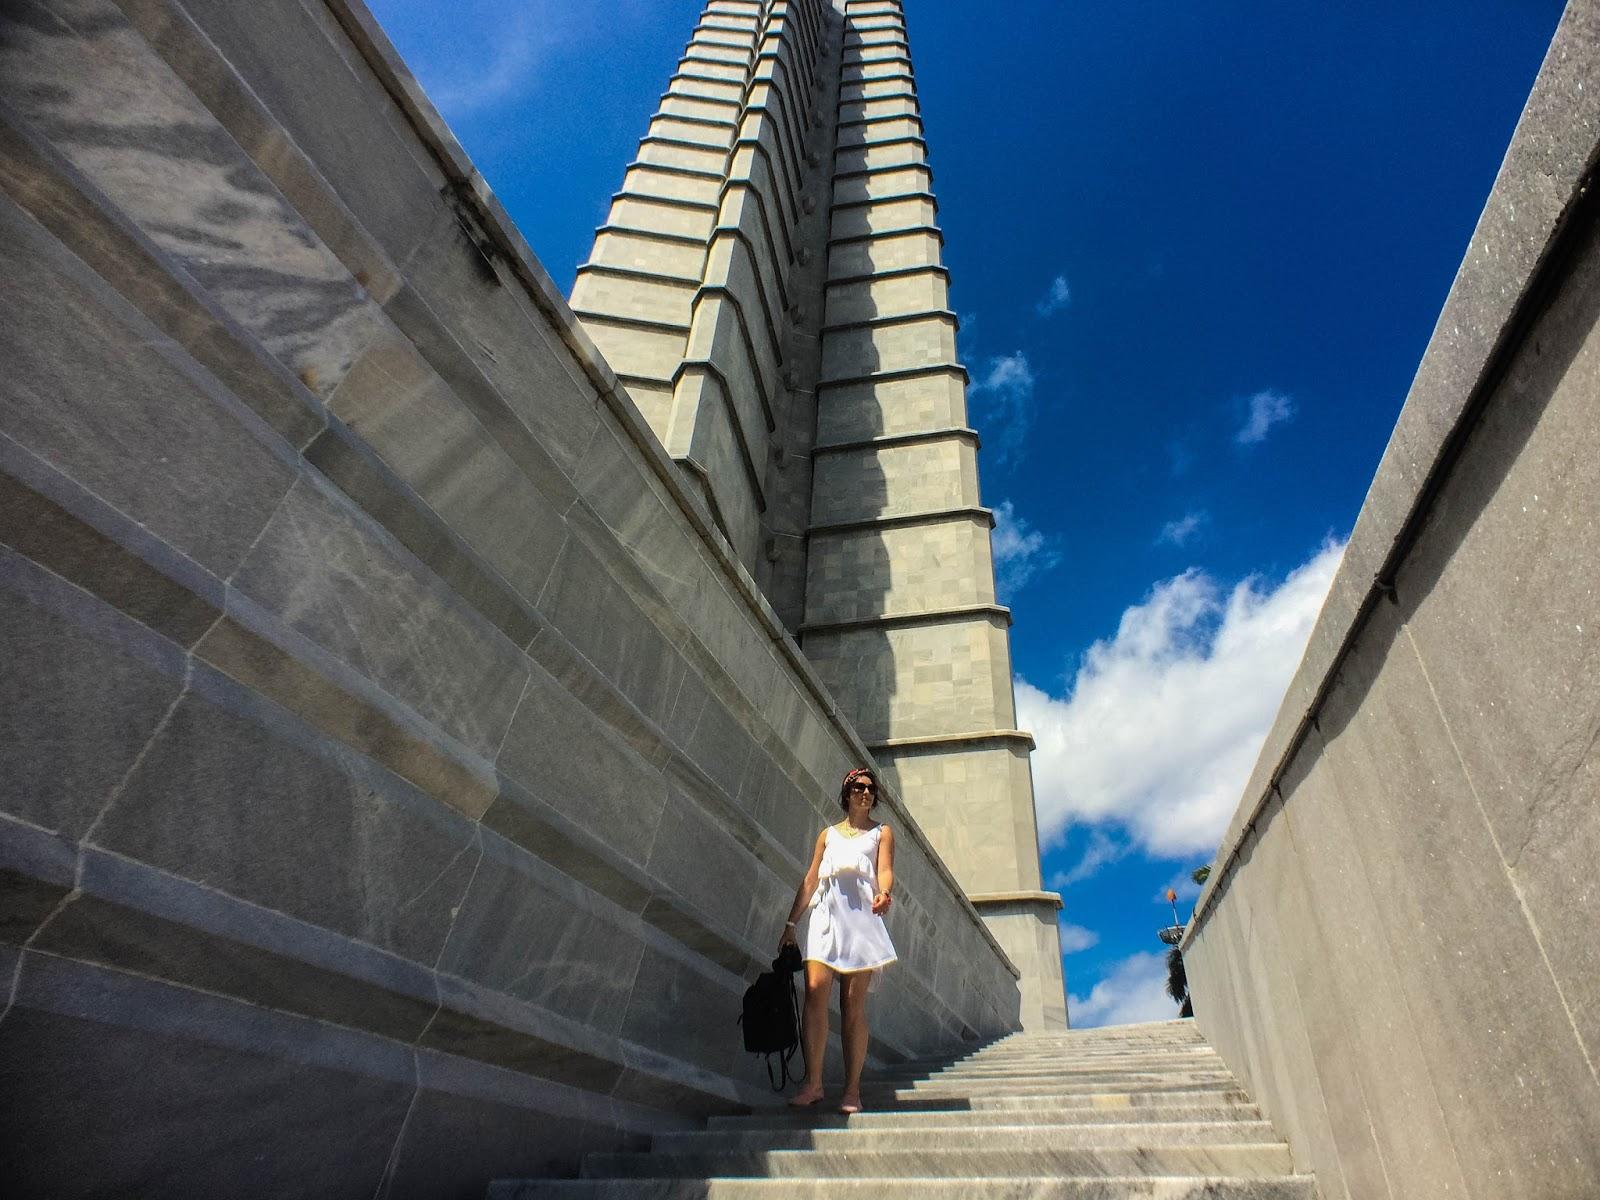 Cuba_Havana_Travelling_Todo_1